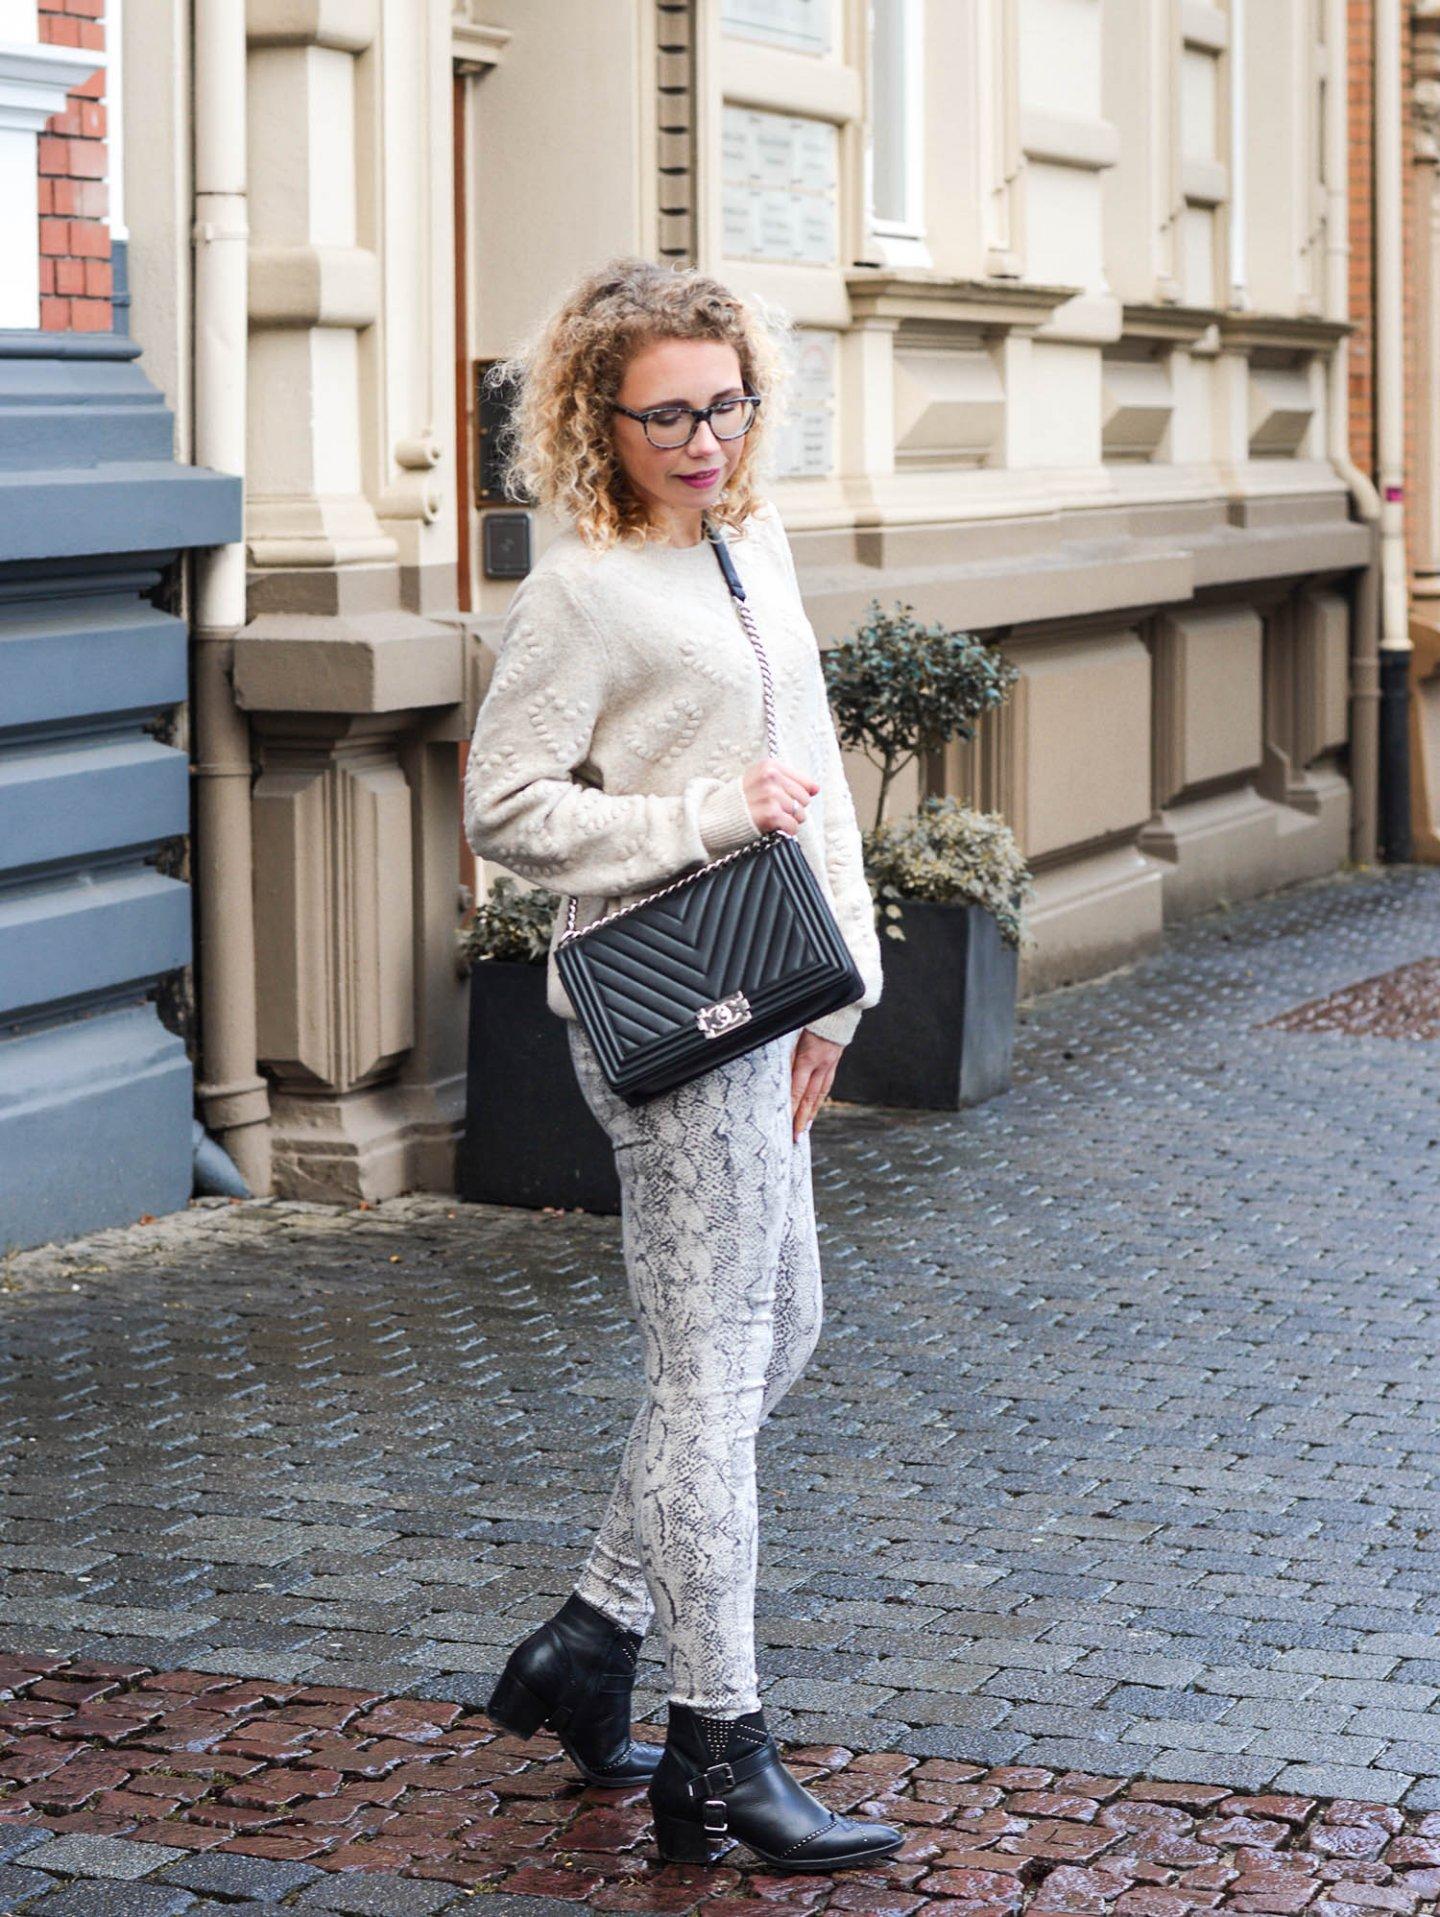 Hosen-mit-Schlangenprint-kationette-fashionblog-fruehlingstrend2019